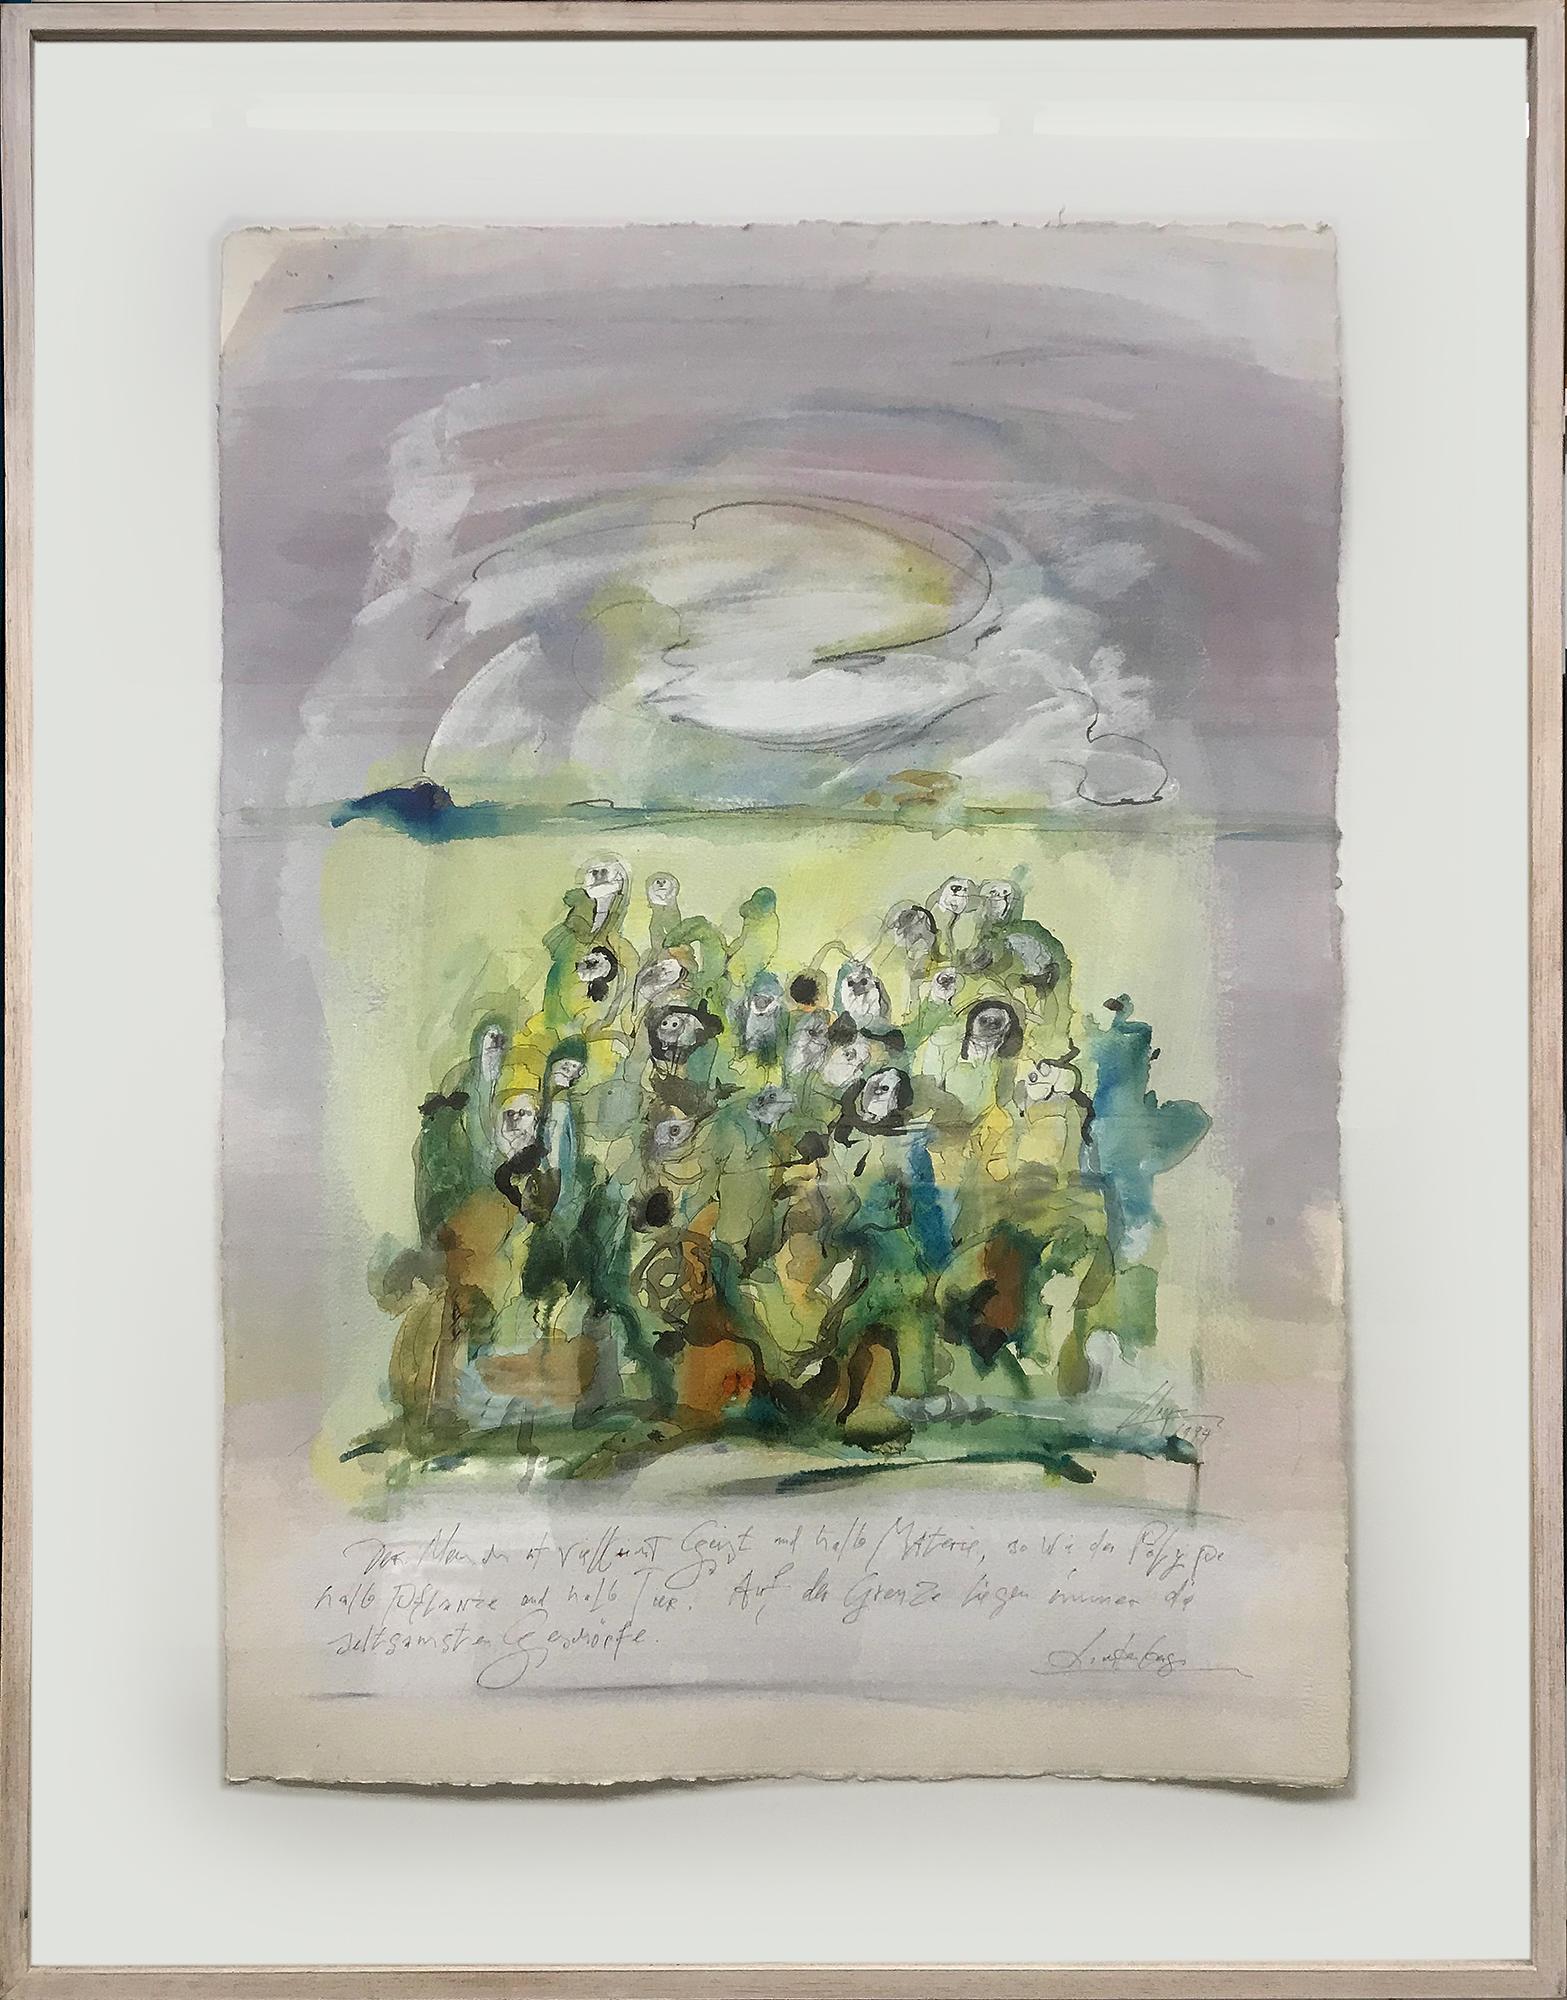 Lichtenberg, 1994, Mischtechnik auf Büttenpapier, 74 x 105 cm, Rahmenmass 100 x 134 cm